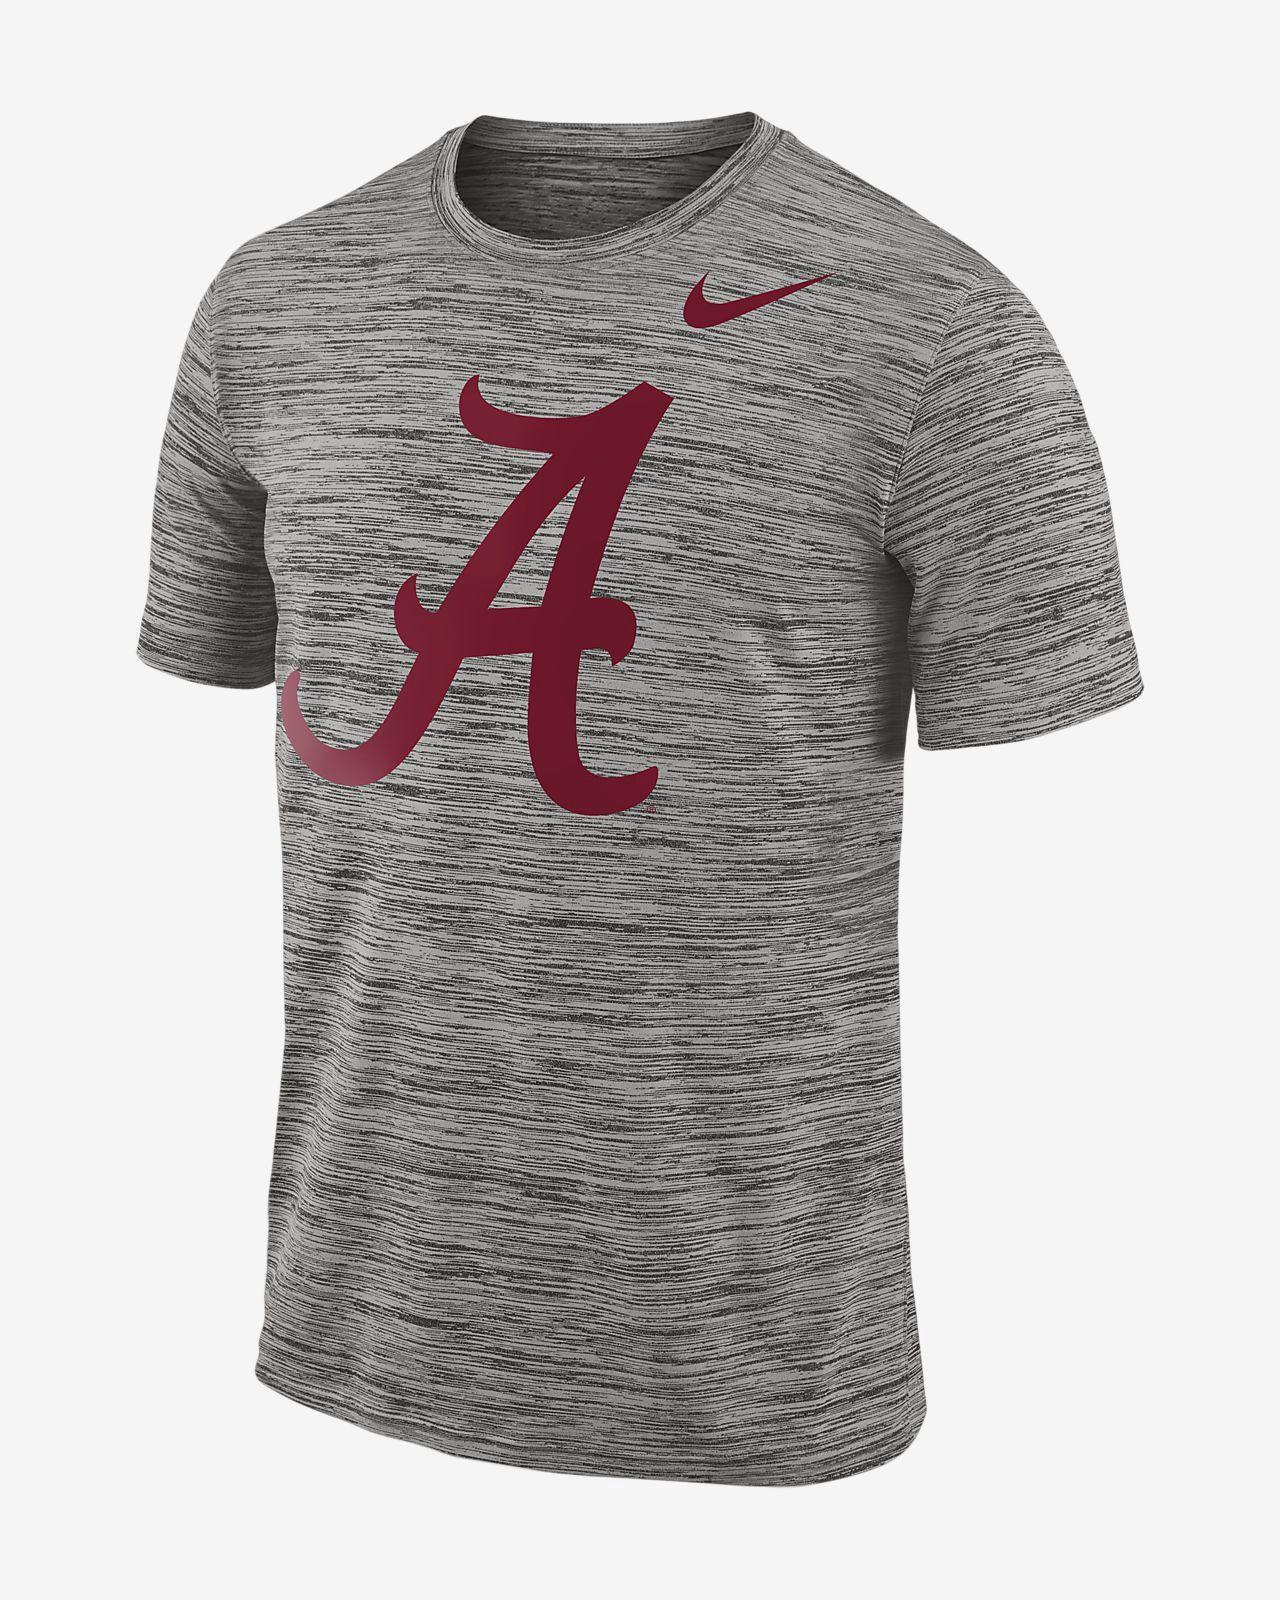 edee73203d Nike College Dri-Fit Legend Travel (Alabama) Men s T-Shirt - S Charcoal